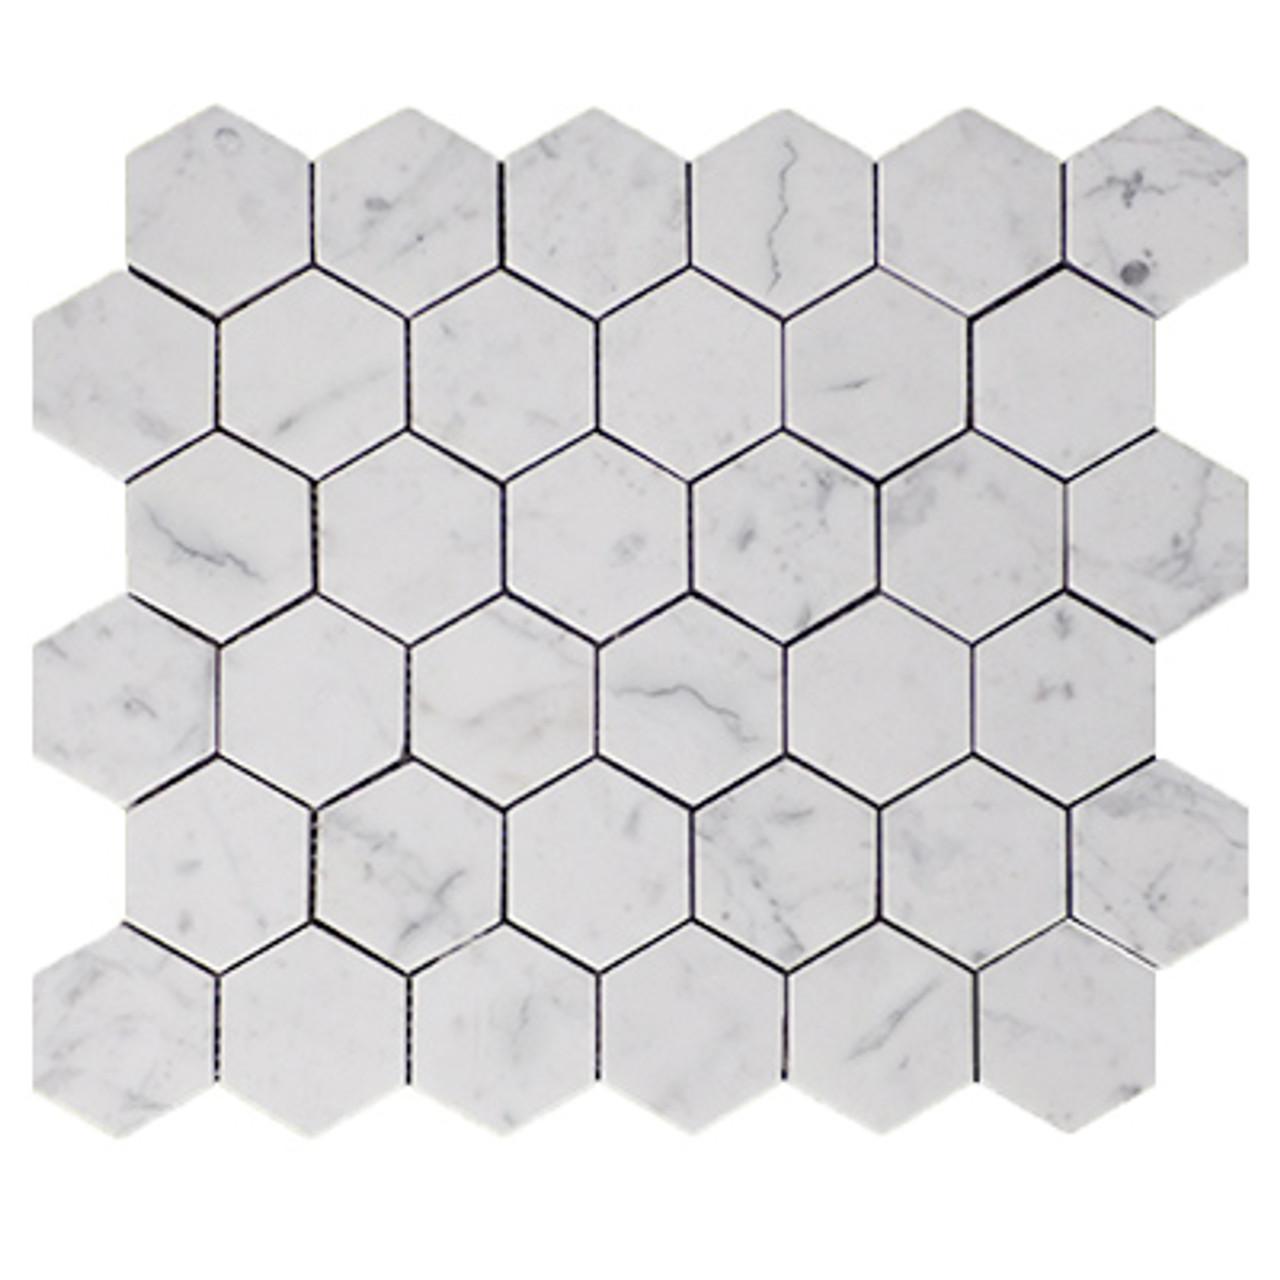 Carrara Marble Italian White Bianco Carrera 2 Hexagon Mosaic Tile Honed